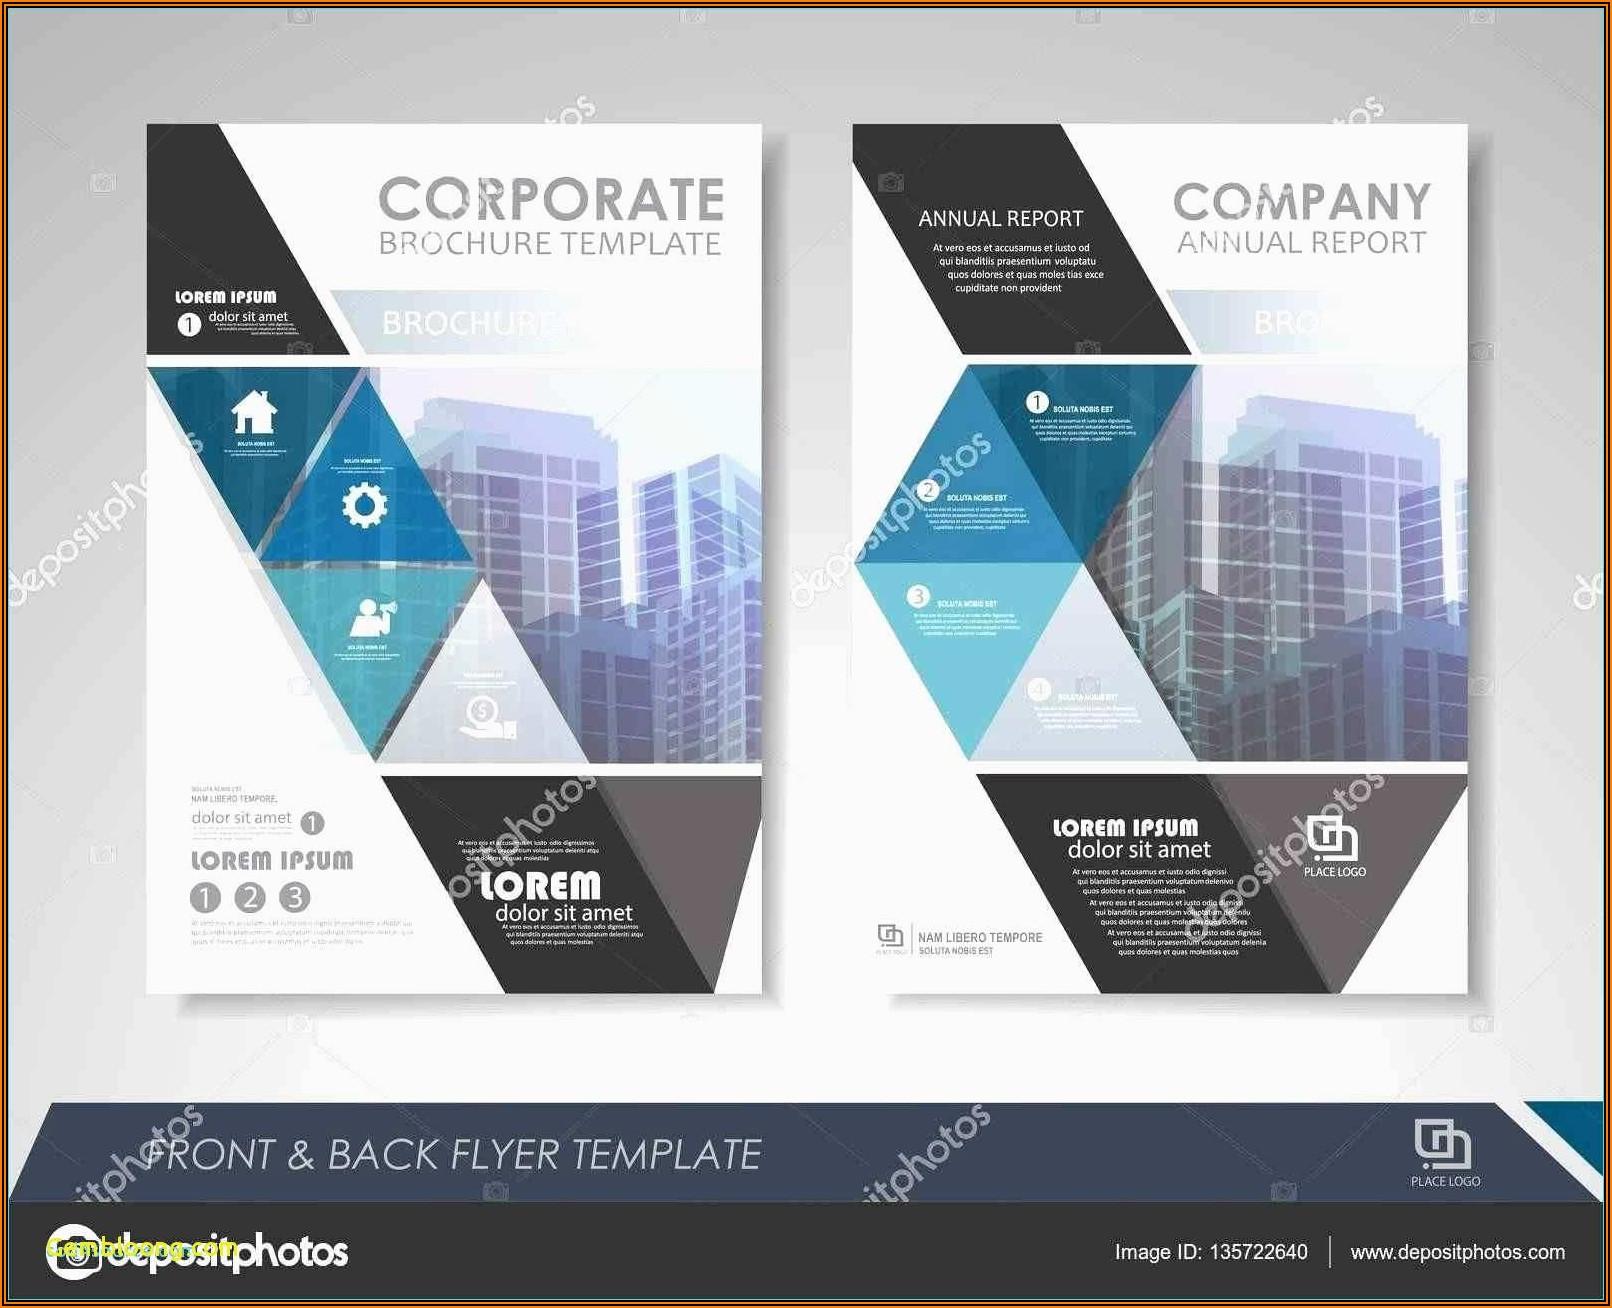 Indesign Brochures Templates Free Download